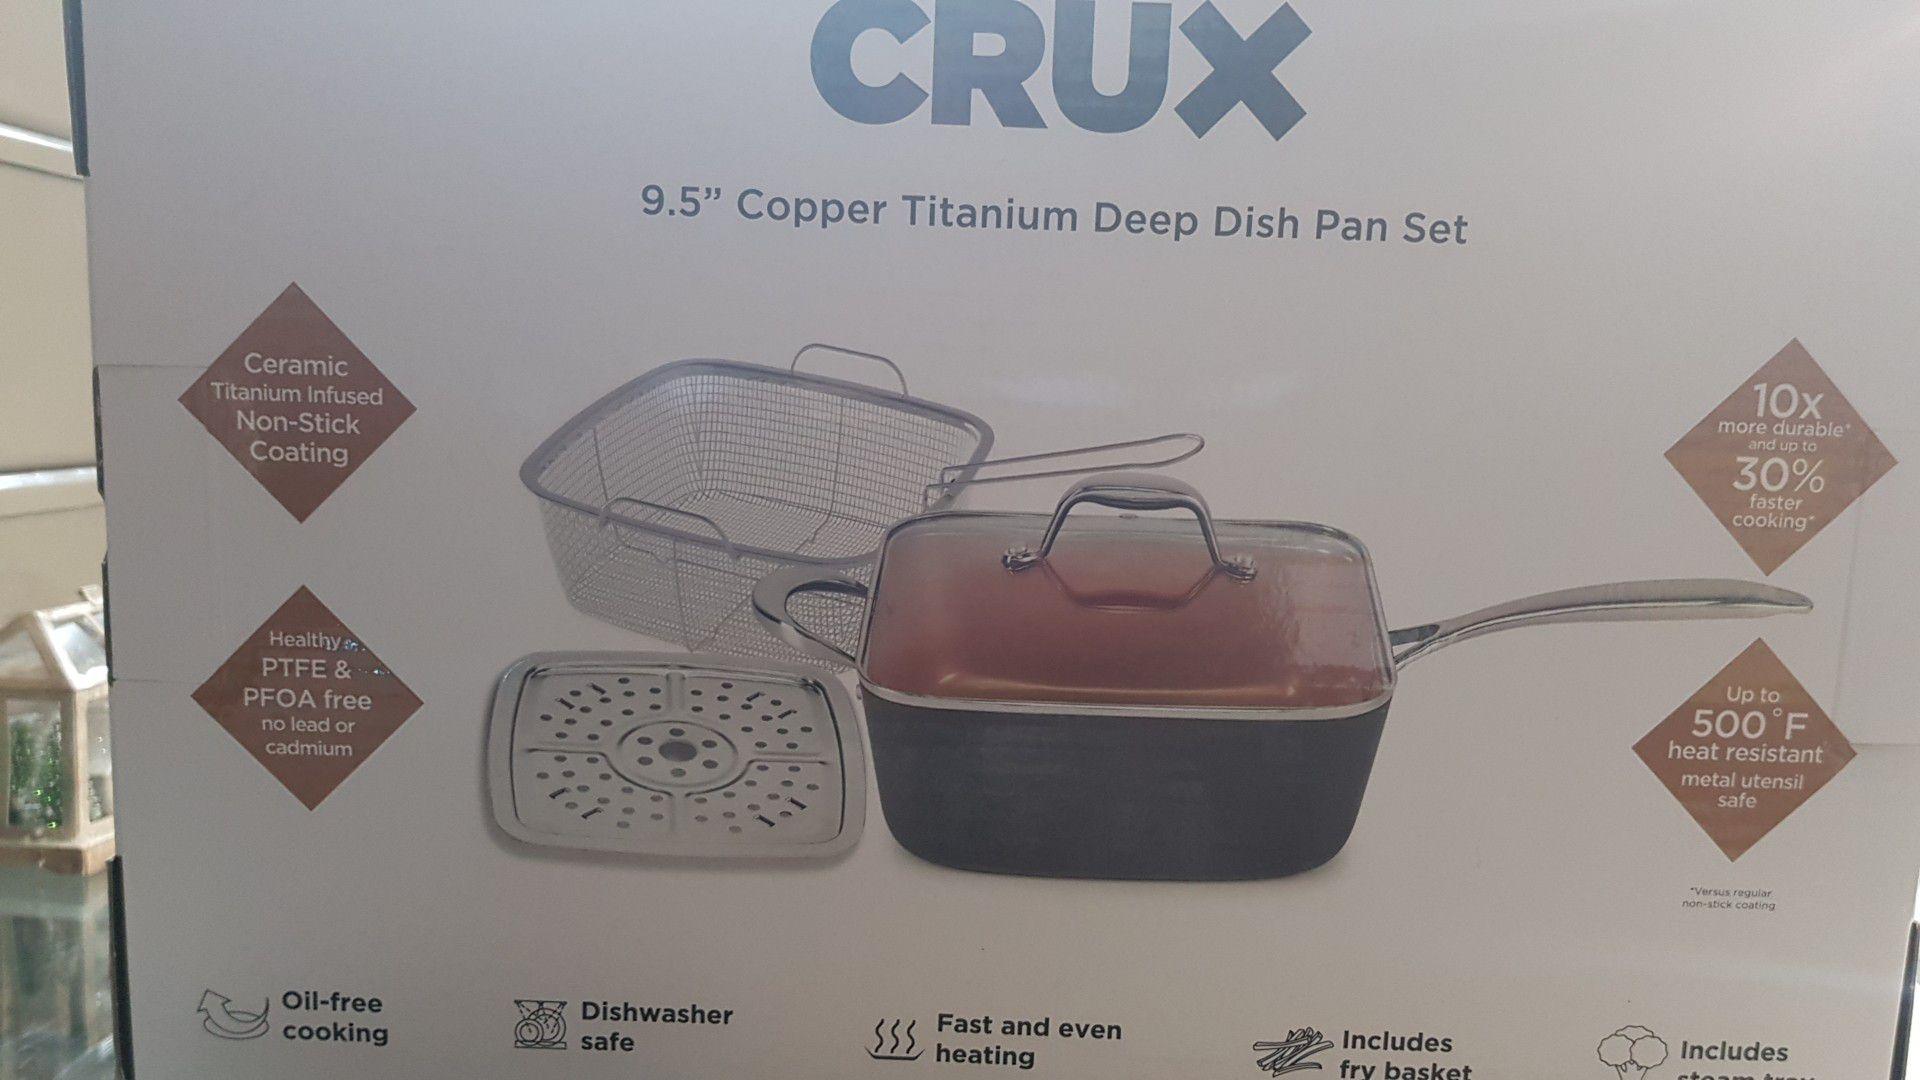 "CRUX 9.5"" COPPER TITANIUM DEEP DISH PAN SET"